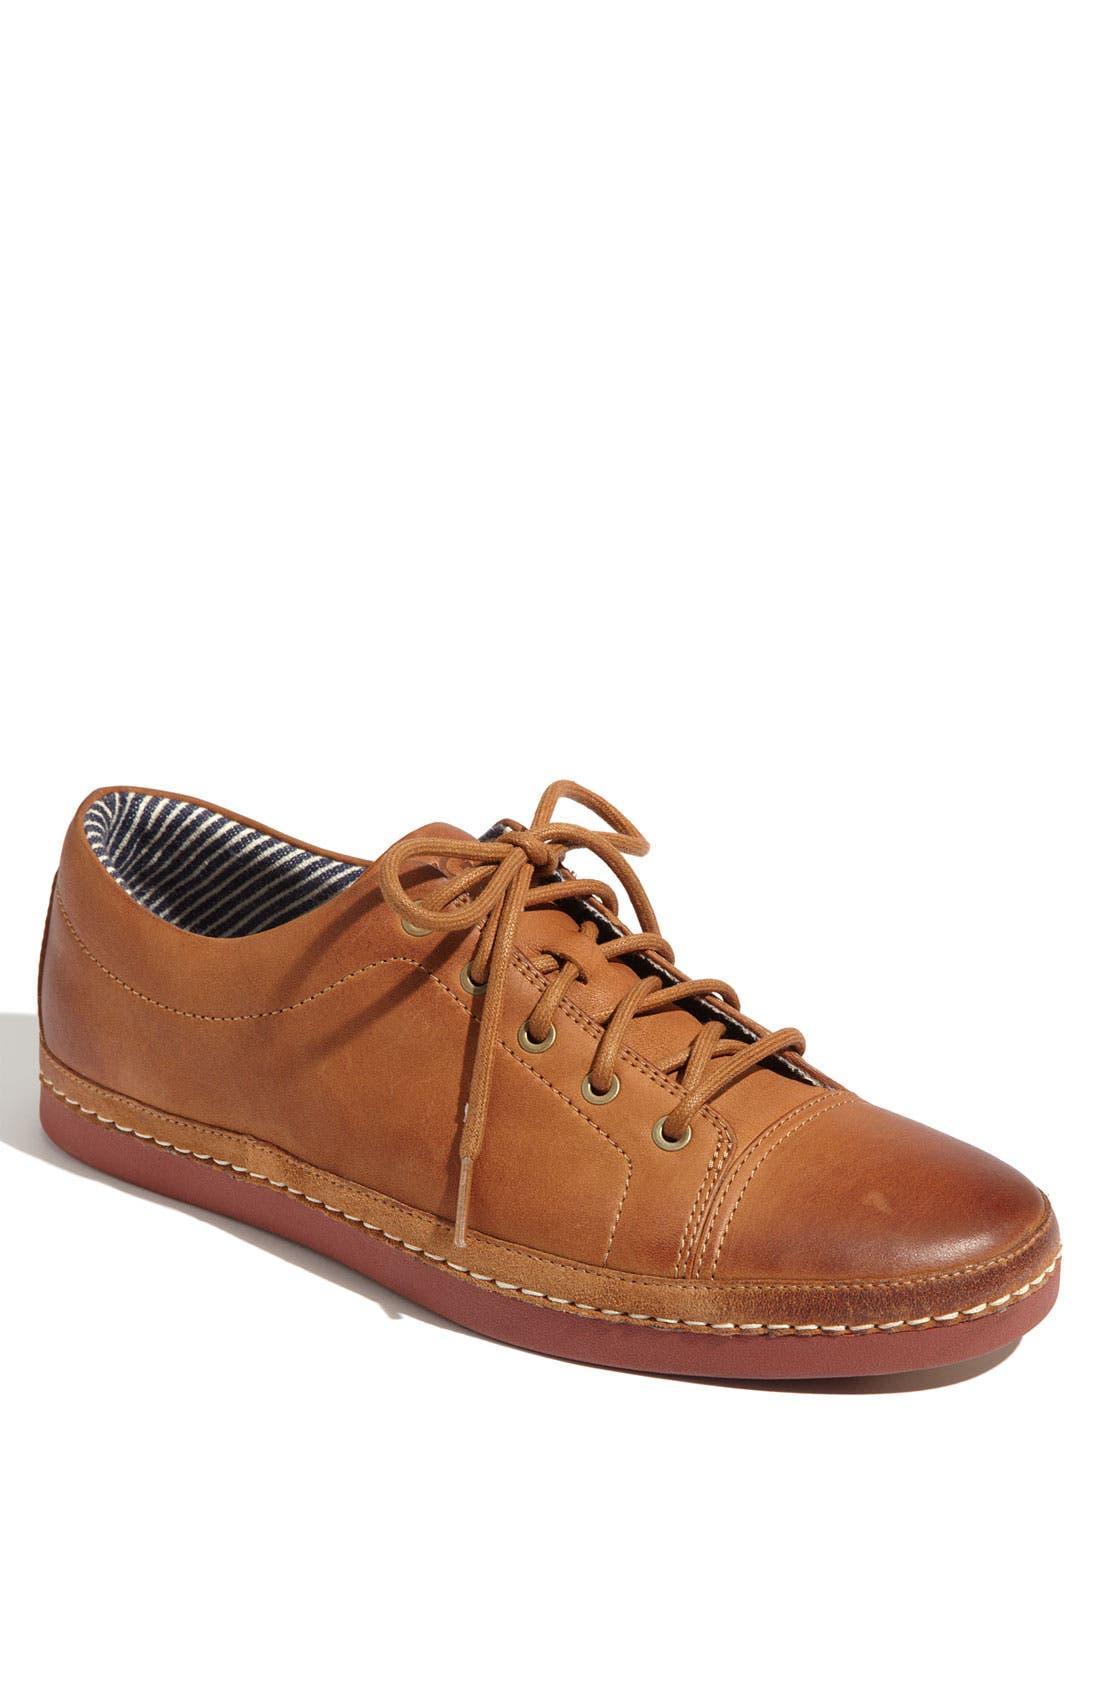 Alternate Image 1 Selected - UGG® Australia 'Duncan Bay' Leather Sneaker (Men)